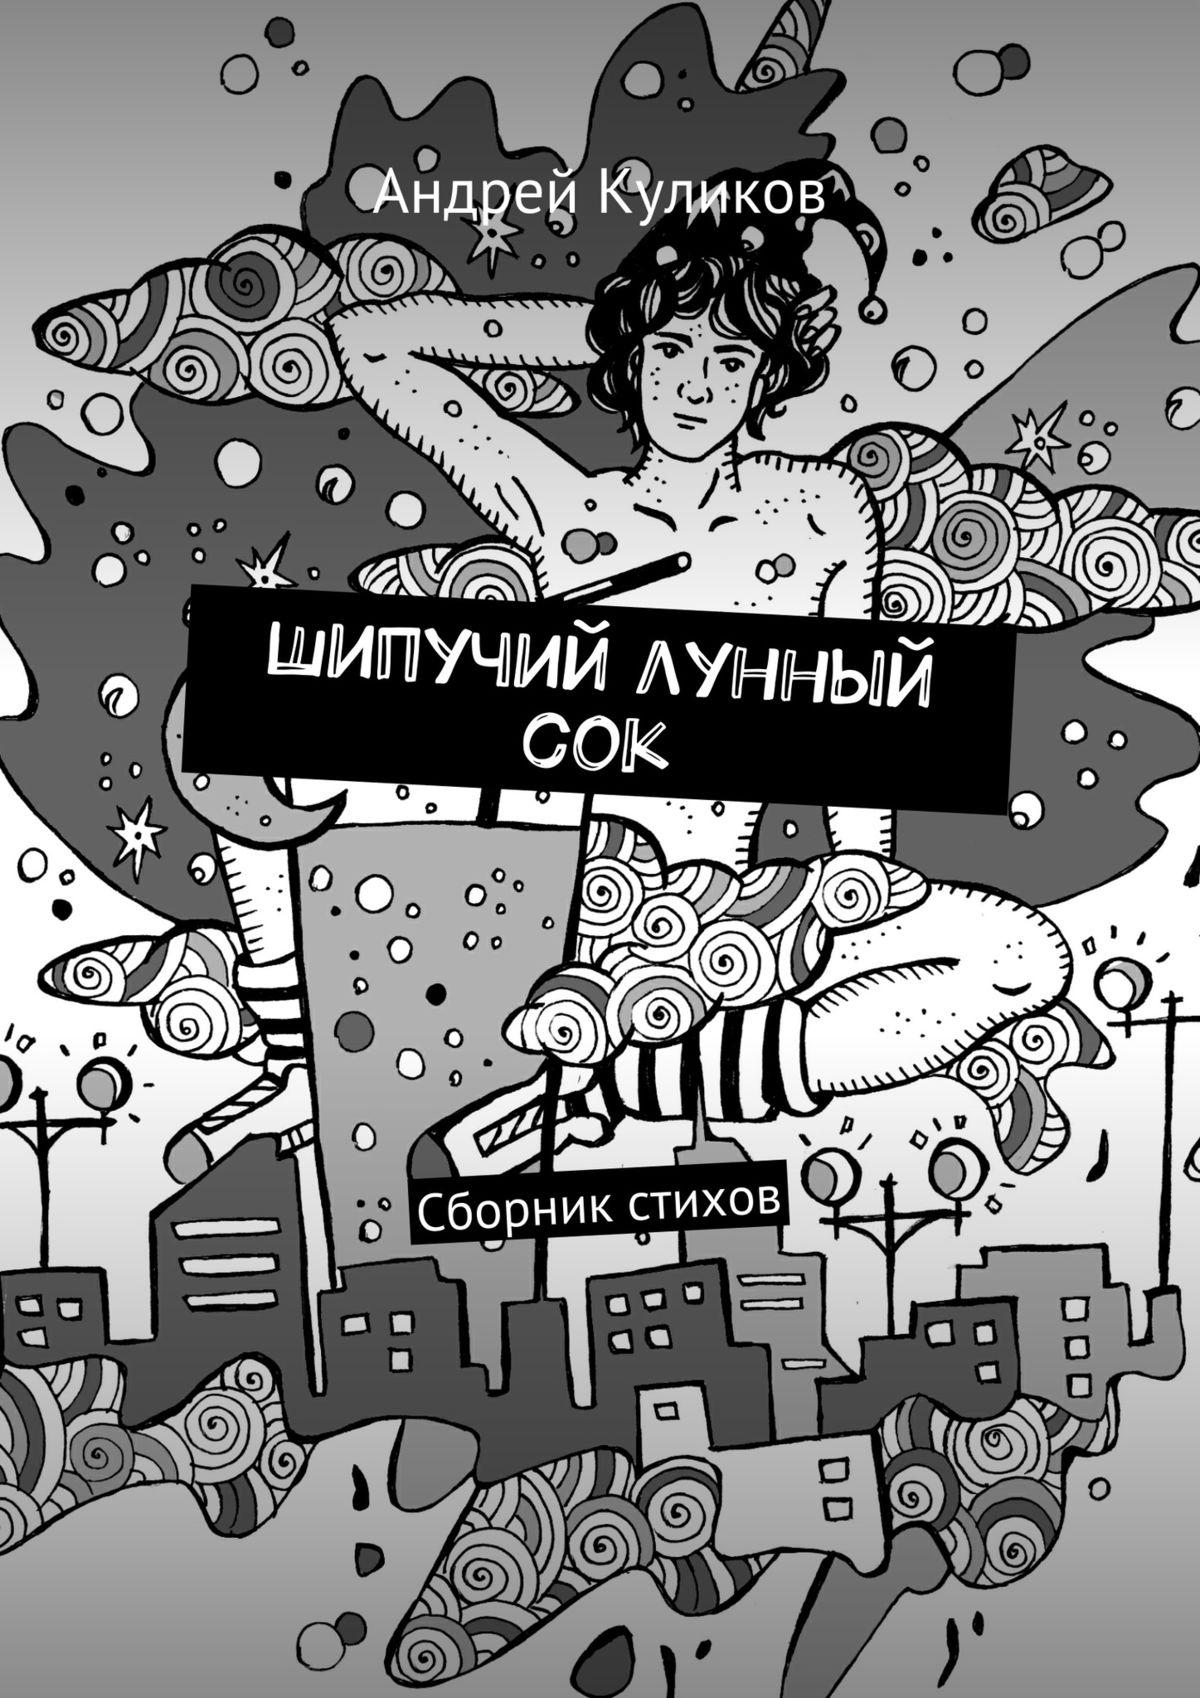 Андрей Куликов Шипучий лунный сок. Сборник стихов андрей андреевич кузнецов сборник стихов